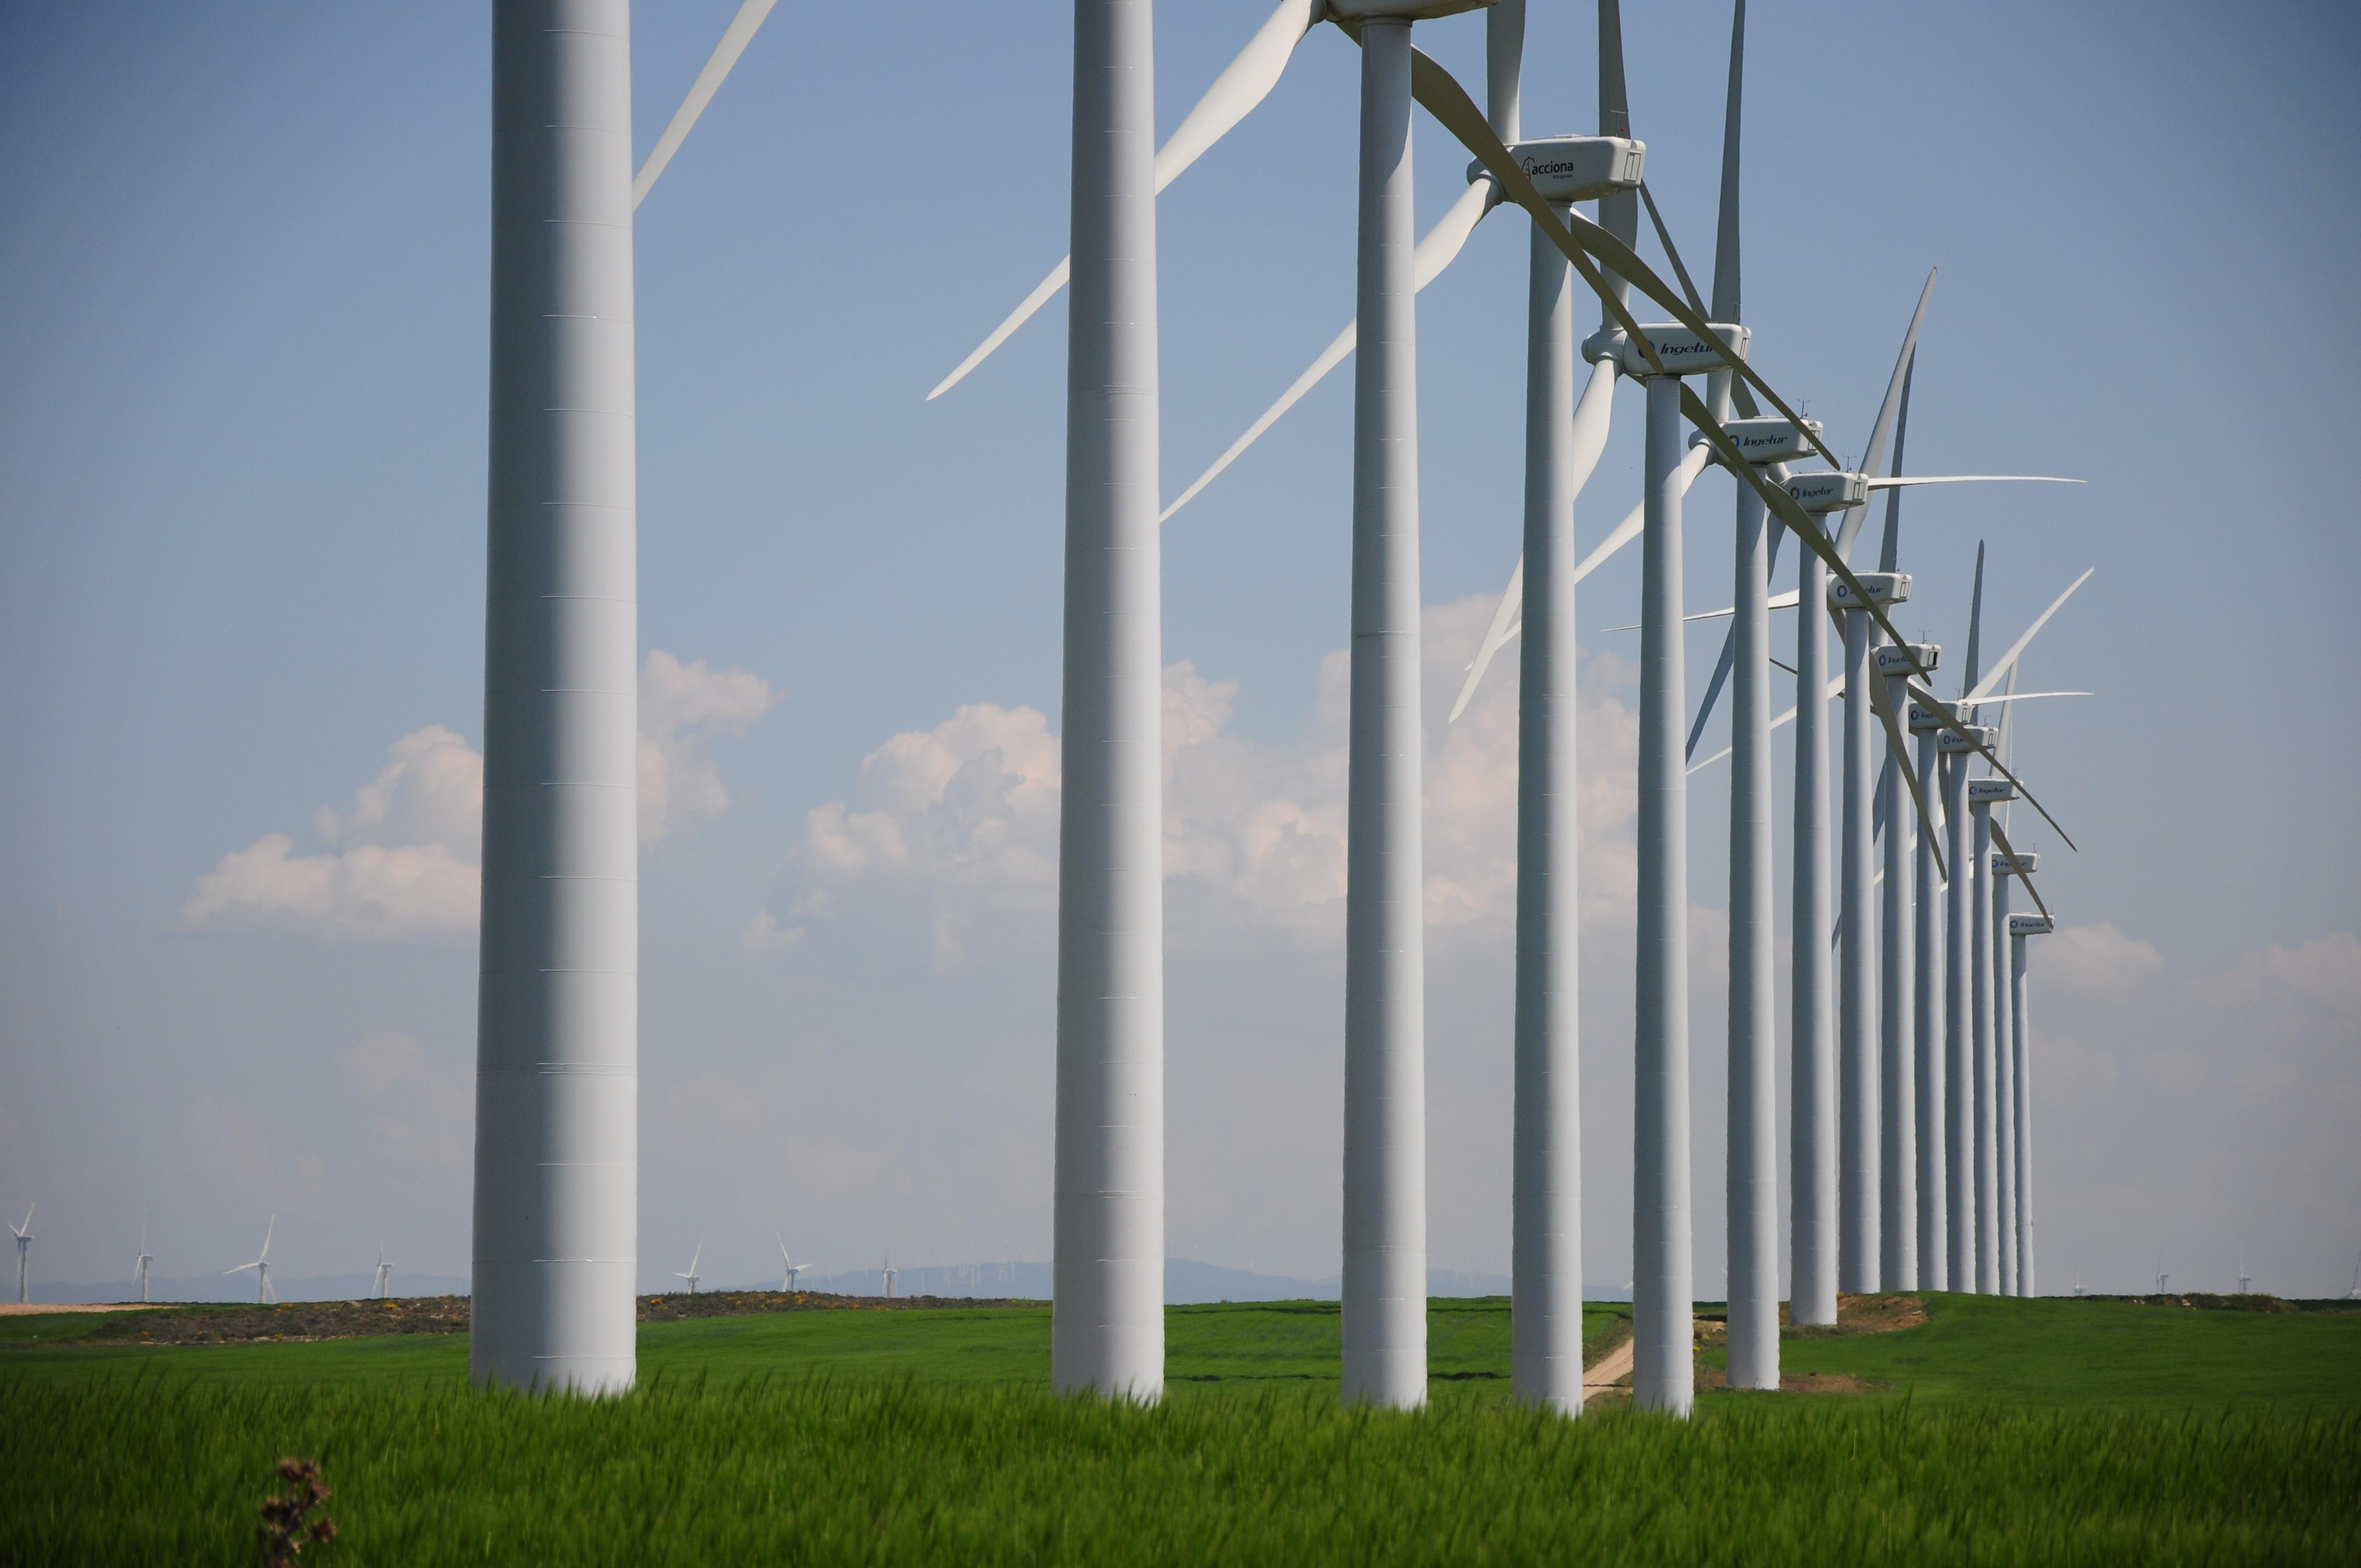 http://www.evwind.com/wp-content/uploads/2012/07/Gotzon-Aznar_En-formacion1.jpg